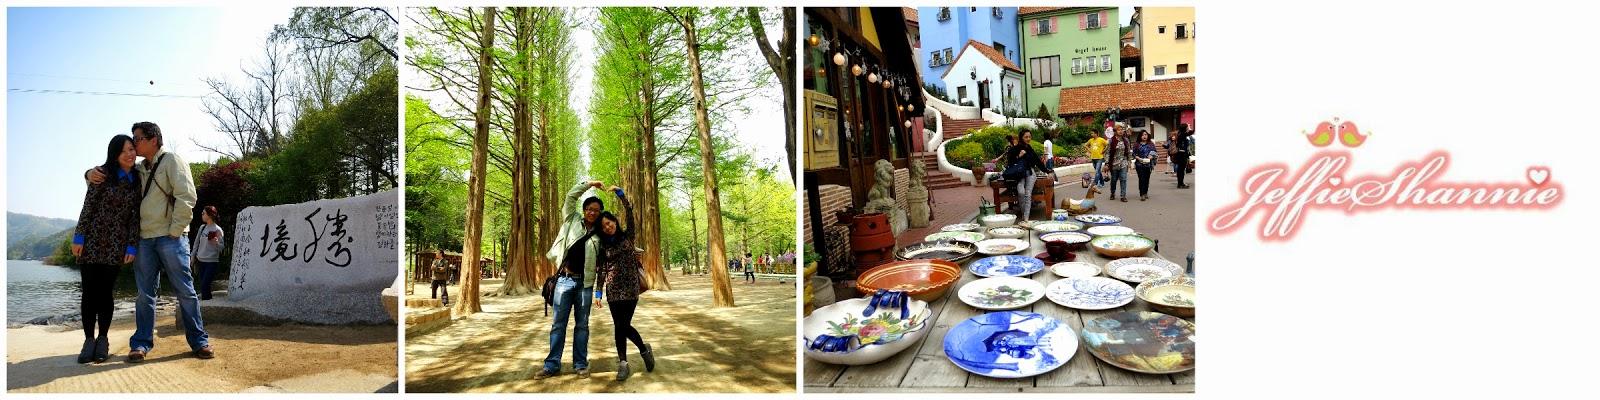 http://jeffieshannie.blogspot.sg/2014/07/seoul-jeju-day-10-namiseon-island.html